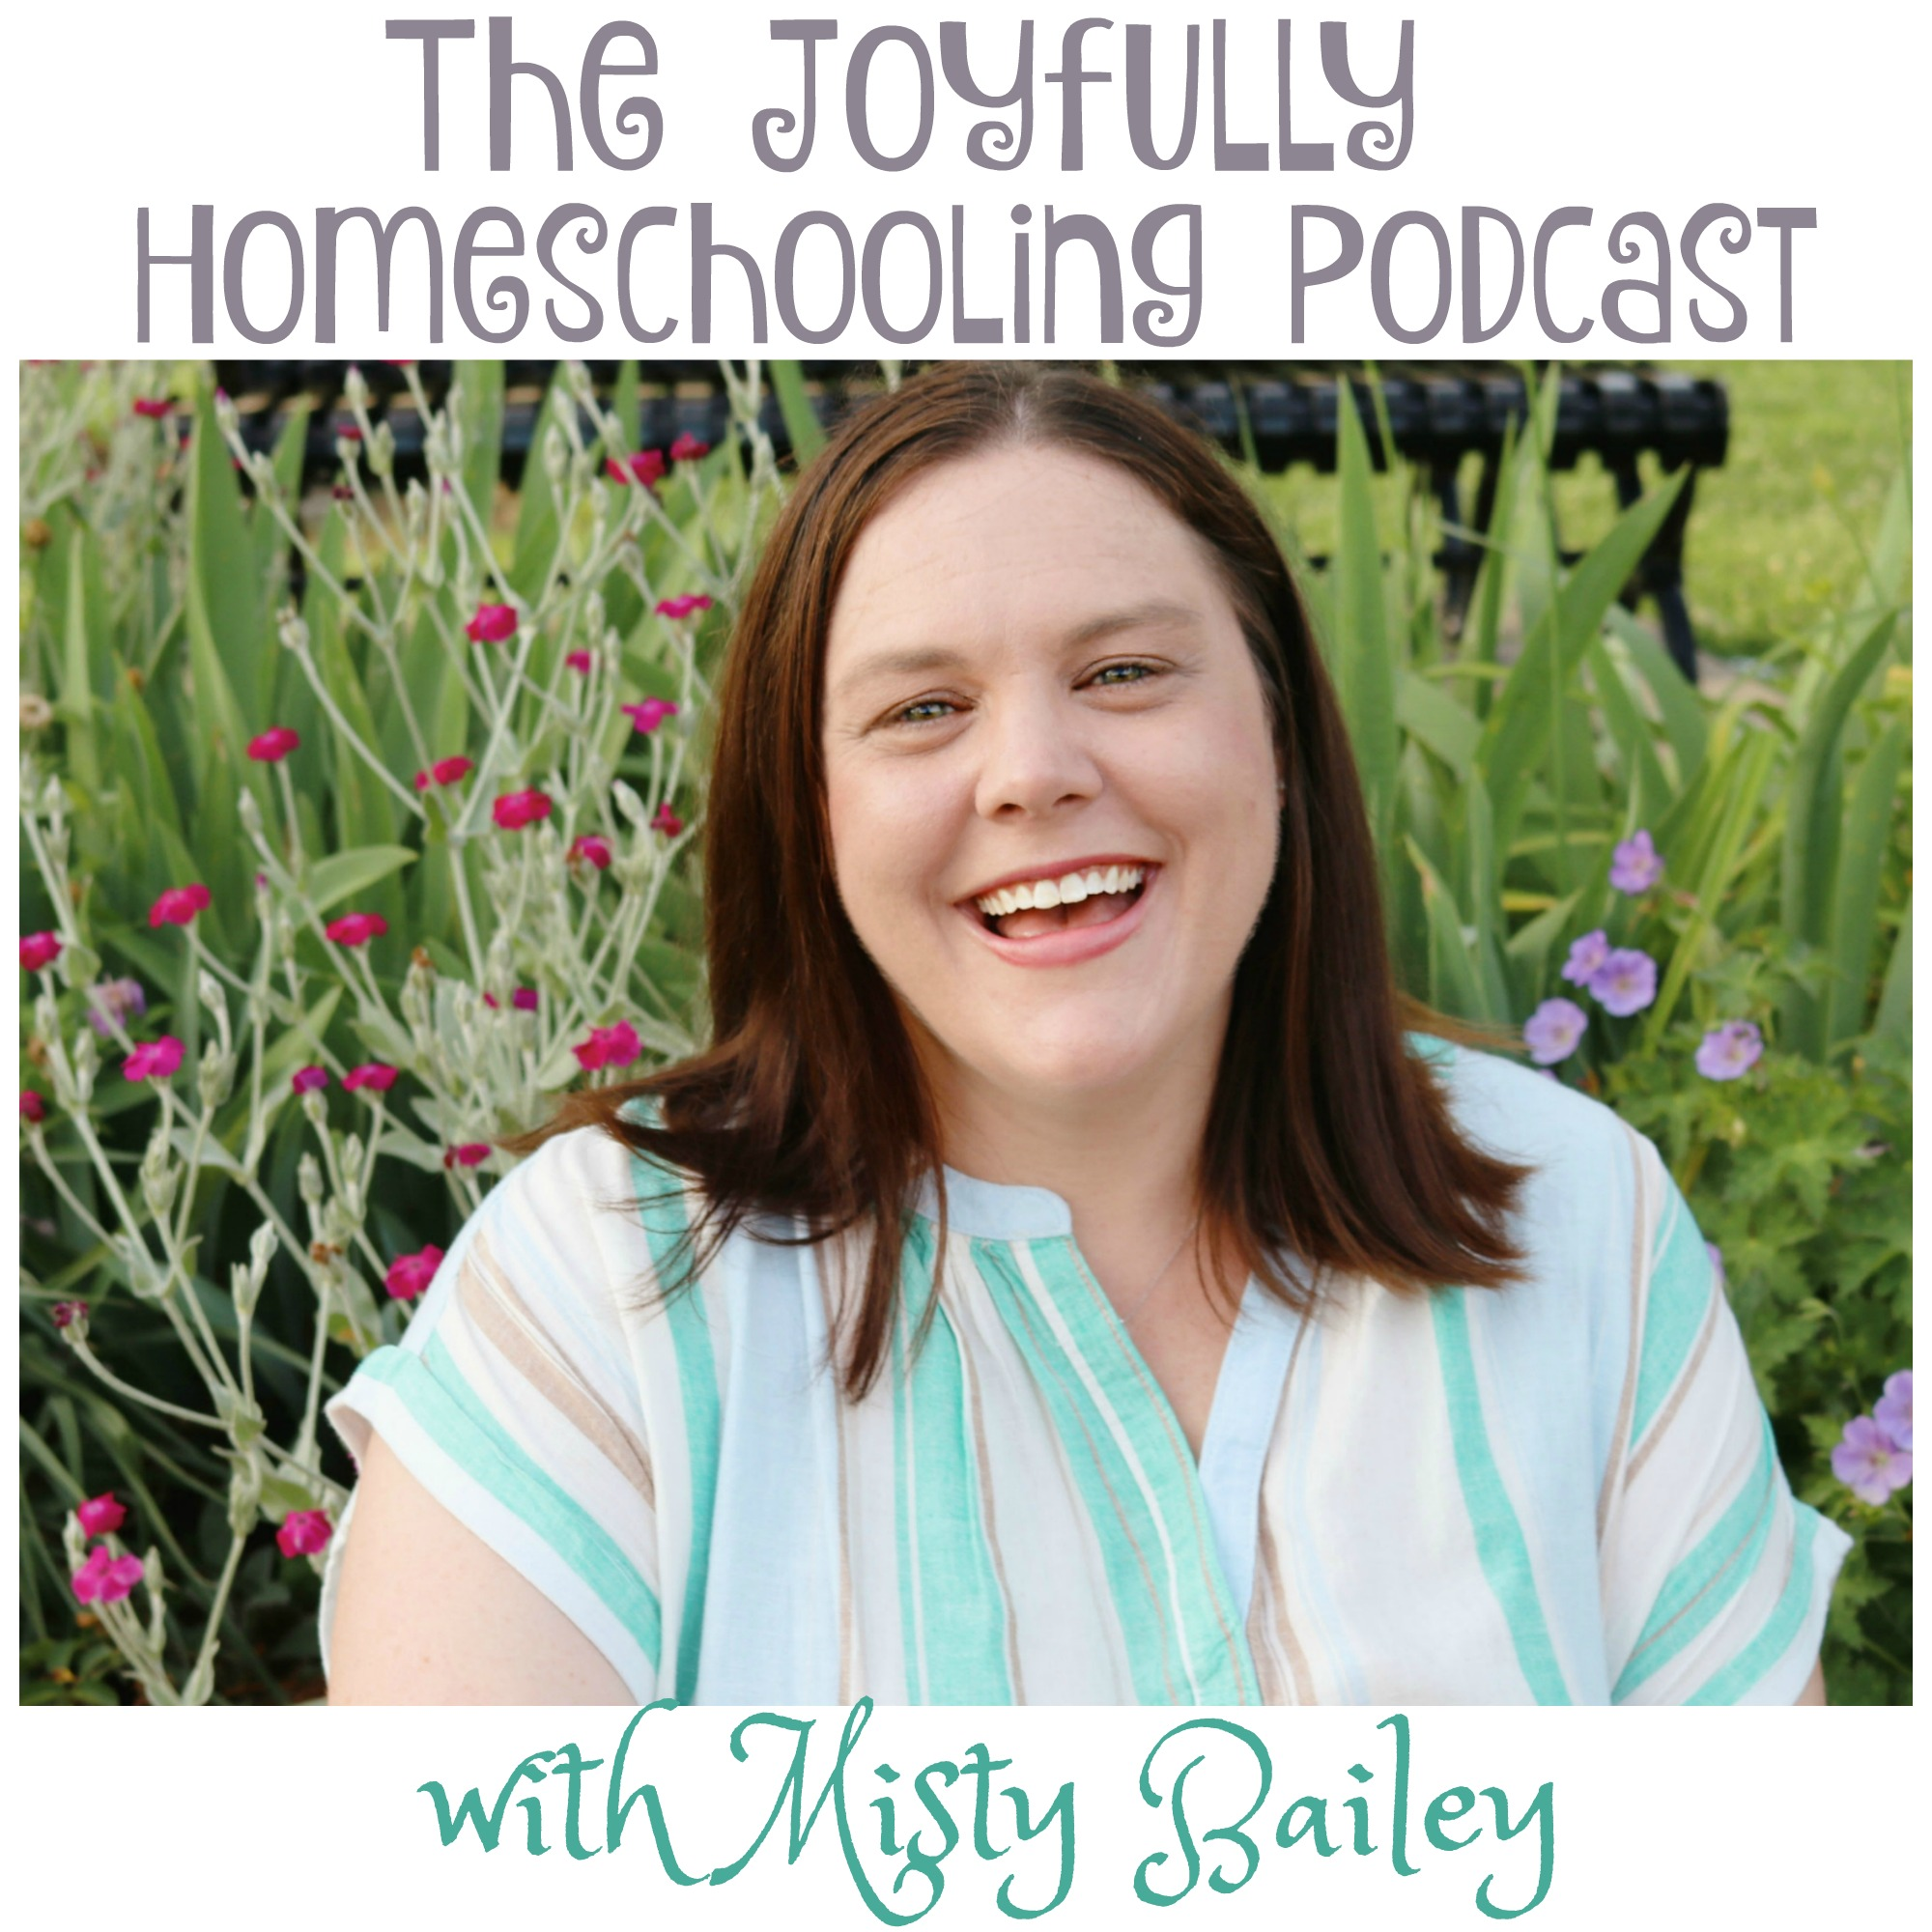 JH134: Self Care and Homeschooling with Kim Santee